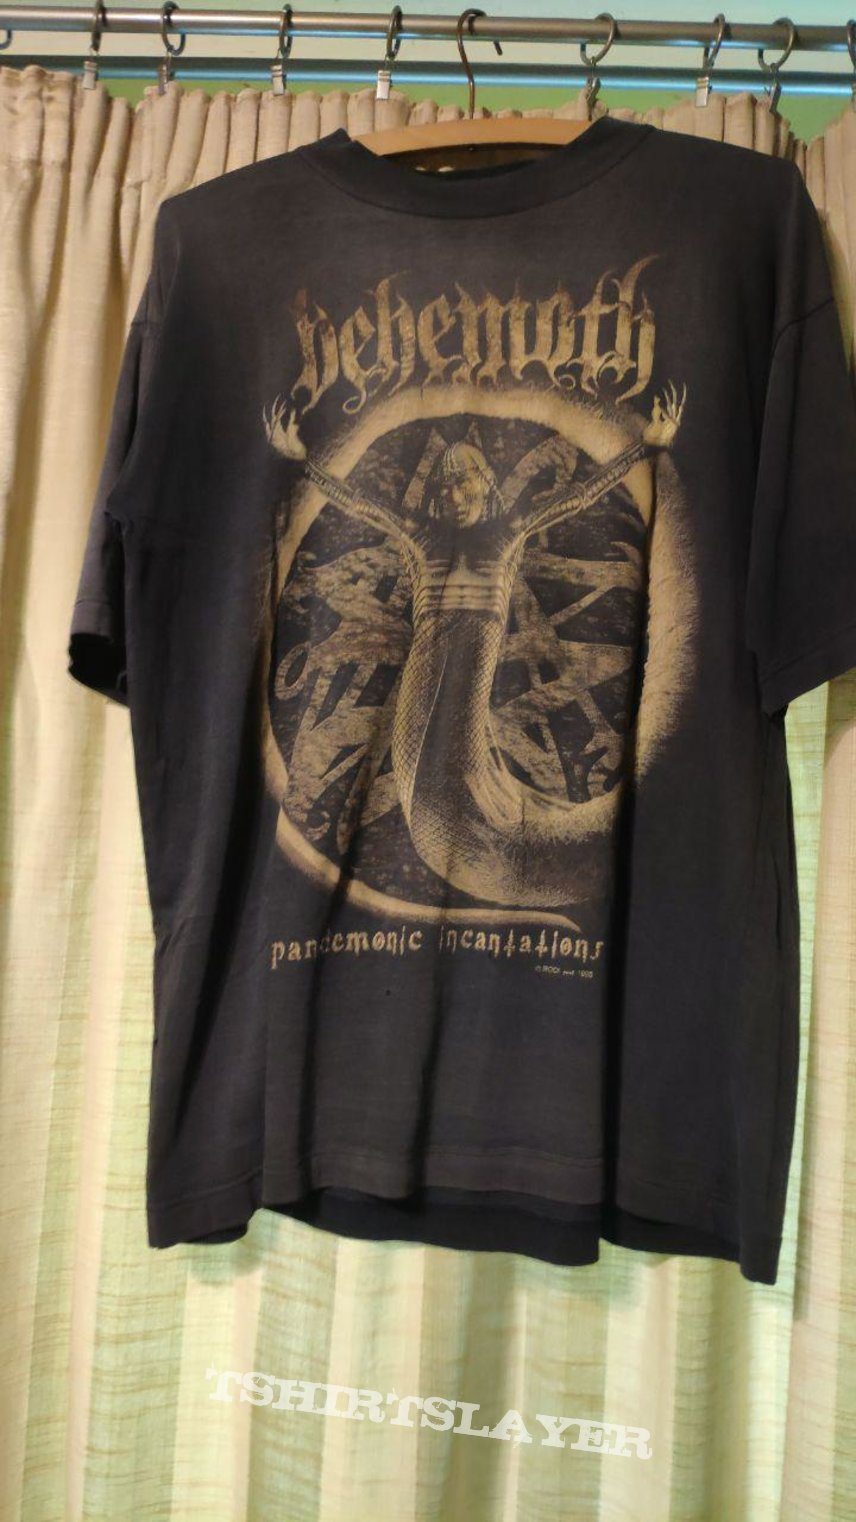 Behemoth - Pandemonic Incantations 19989 Vox Mortis